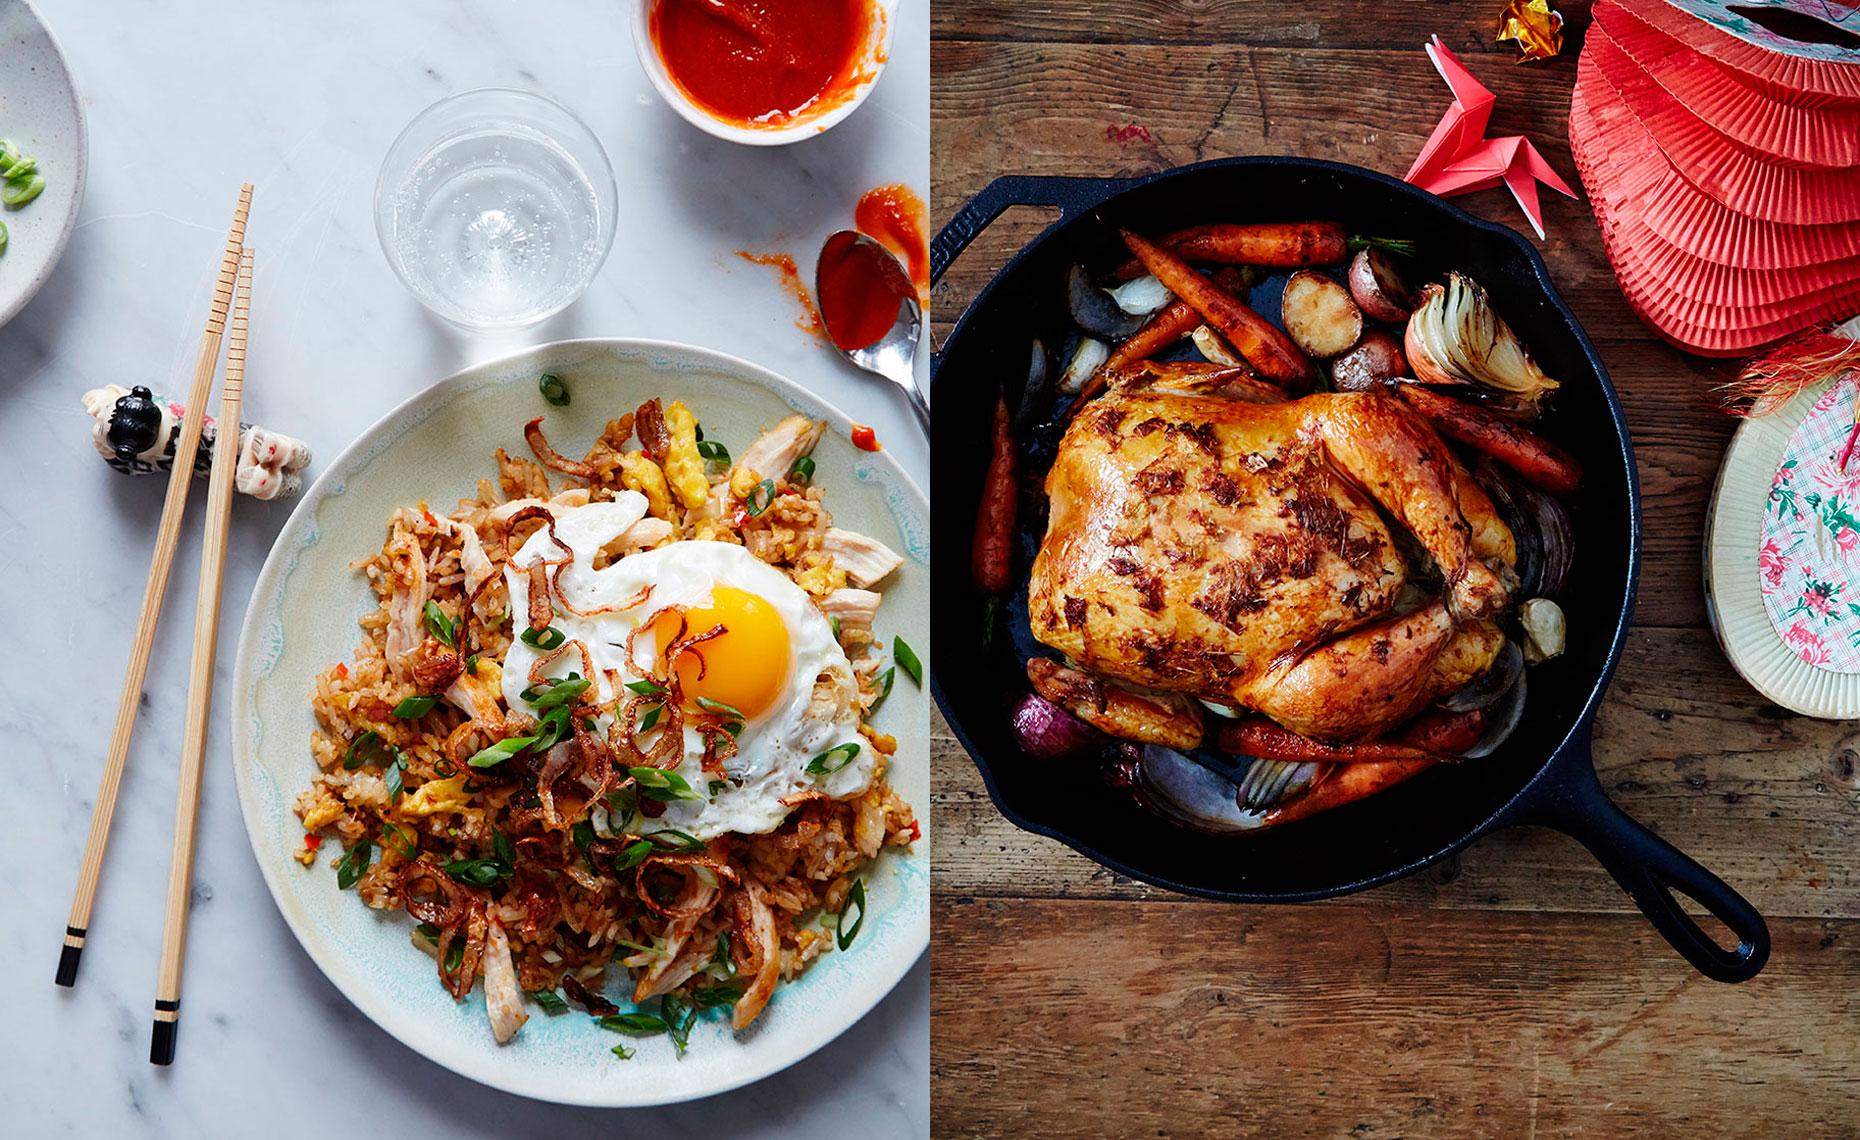 egg-rice-and-roast-chicken.jpg